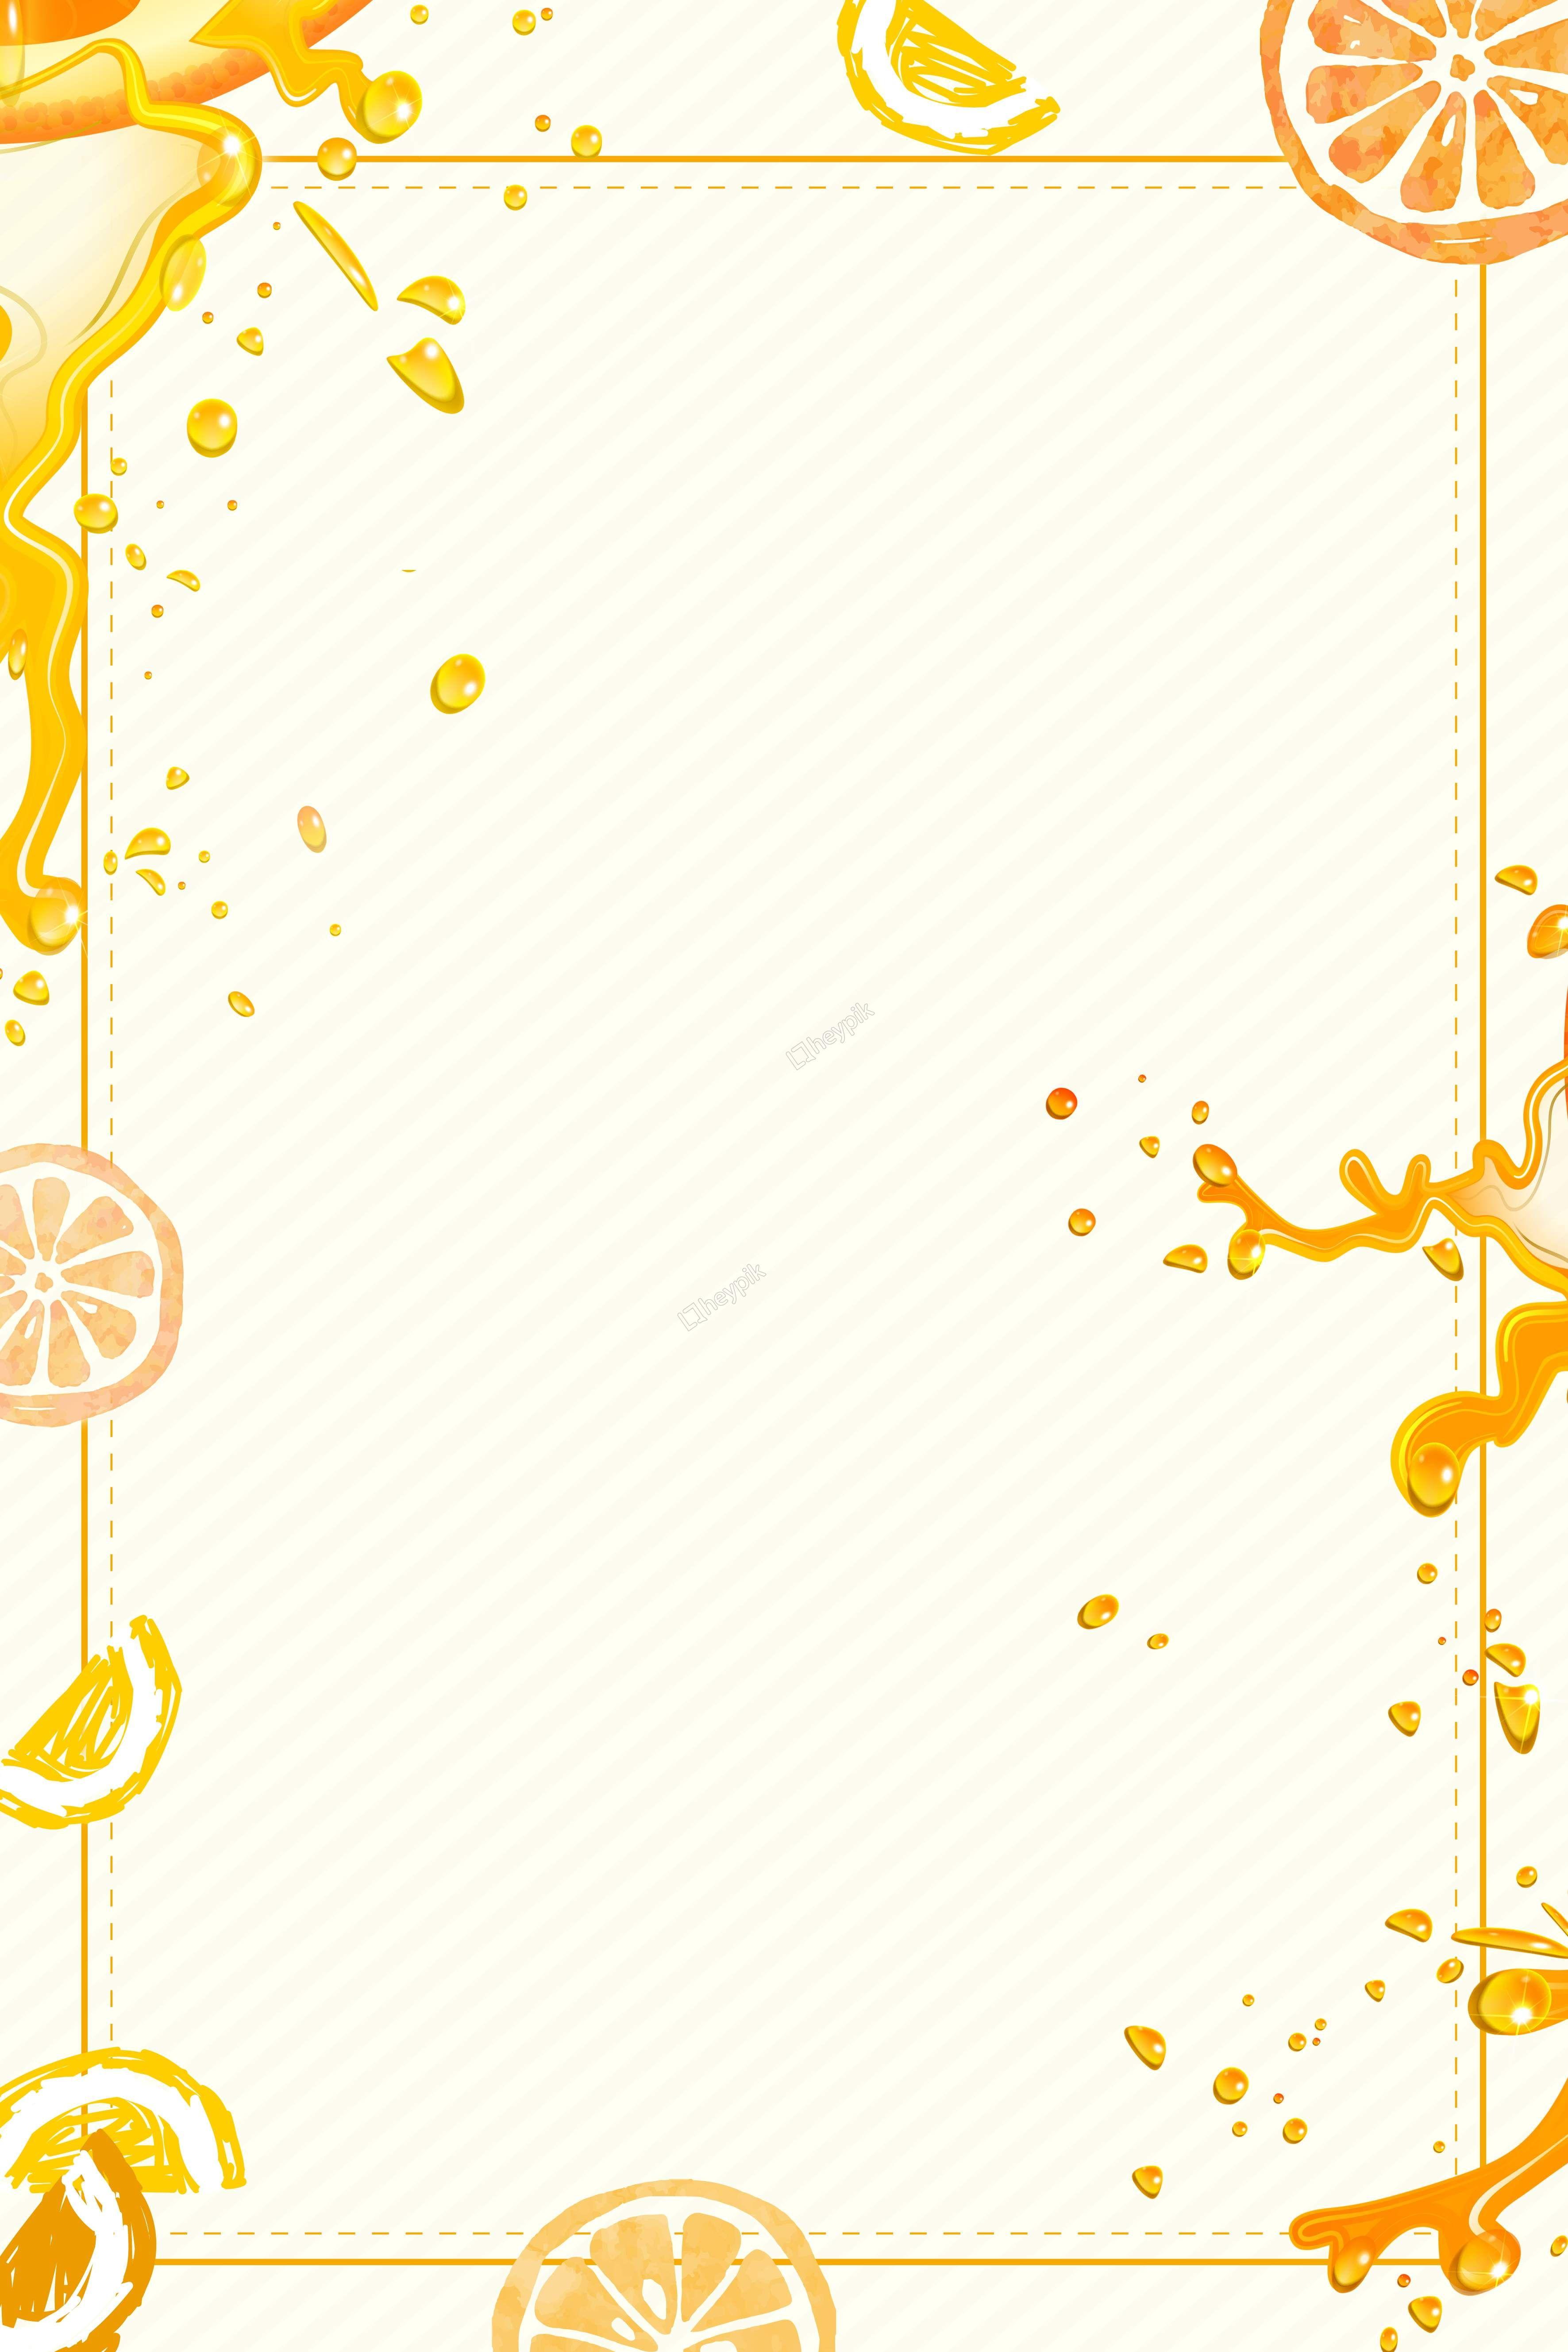 orange juice.juice background templates fruit drinks the